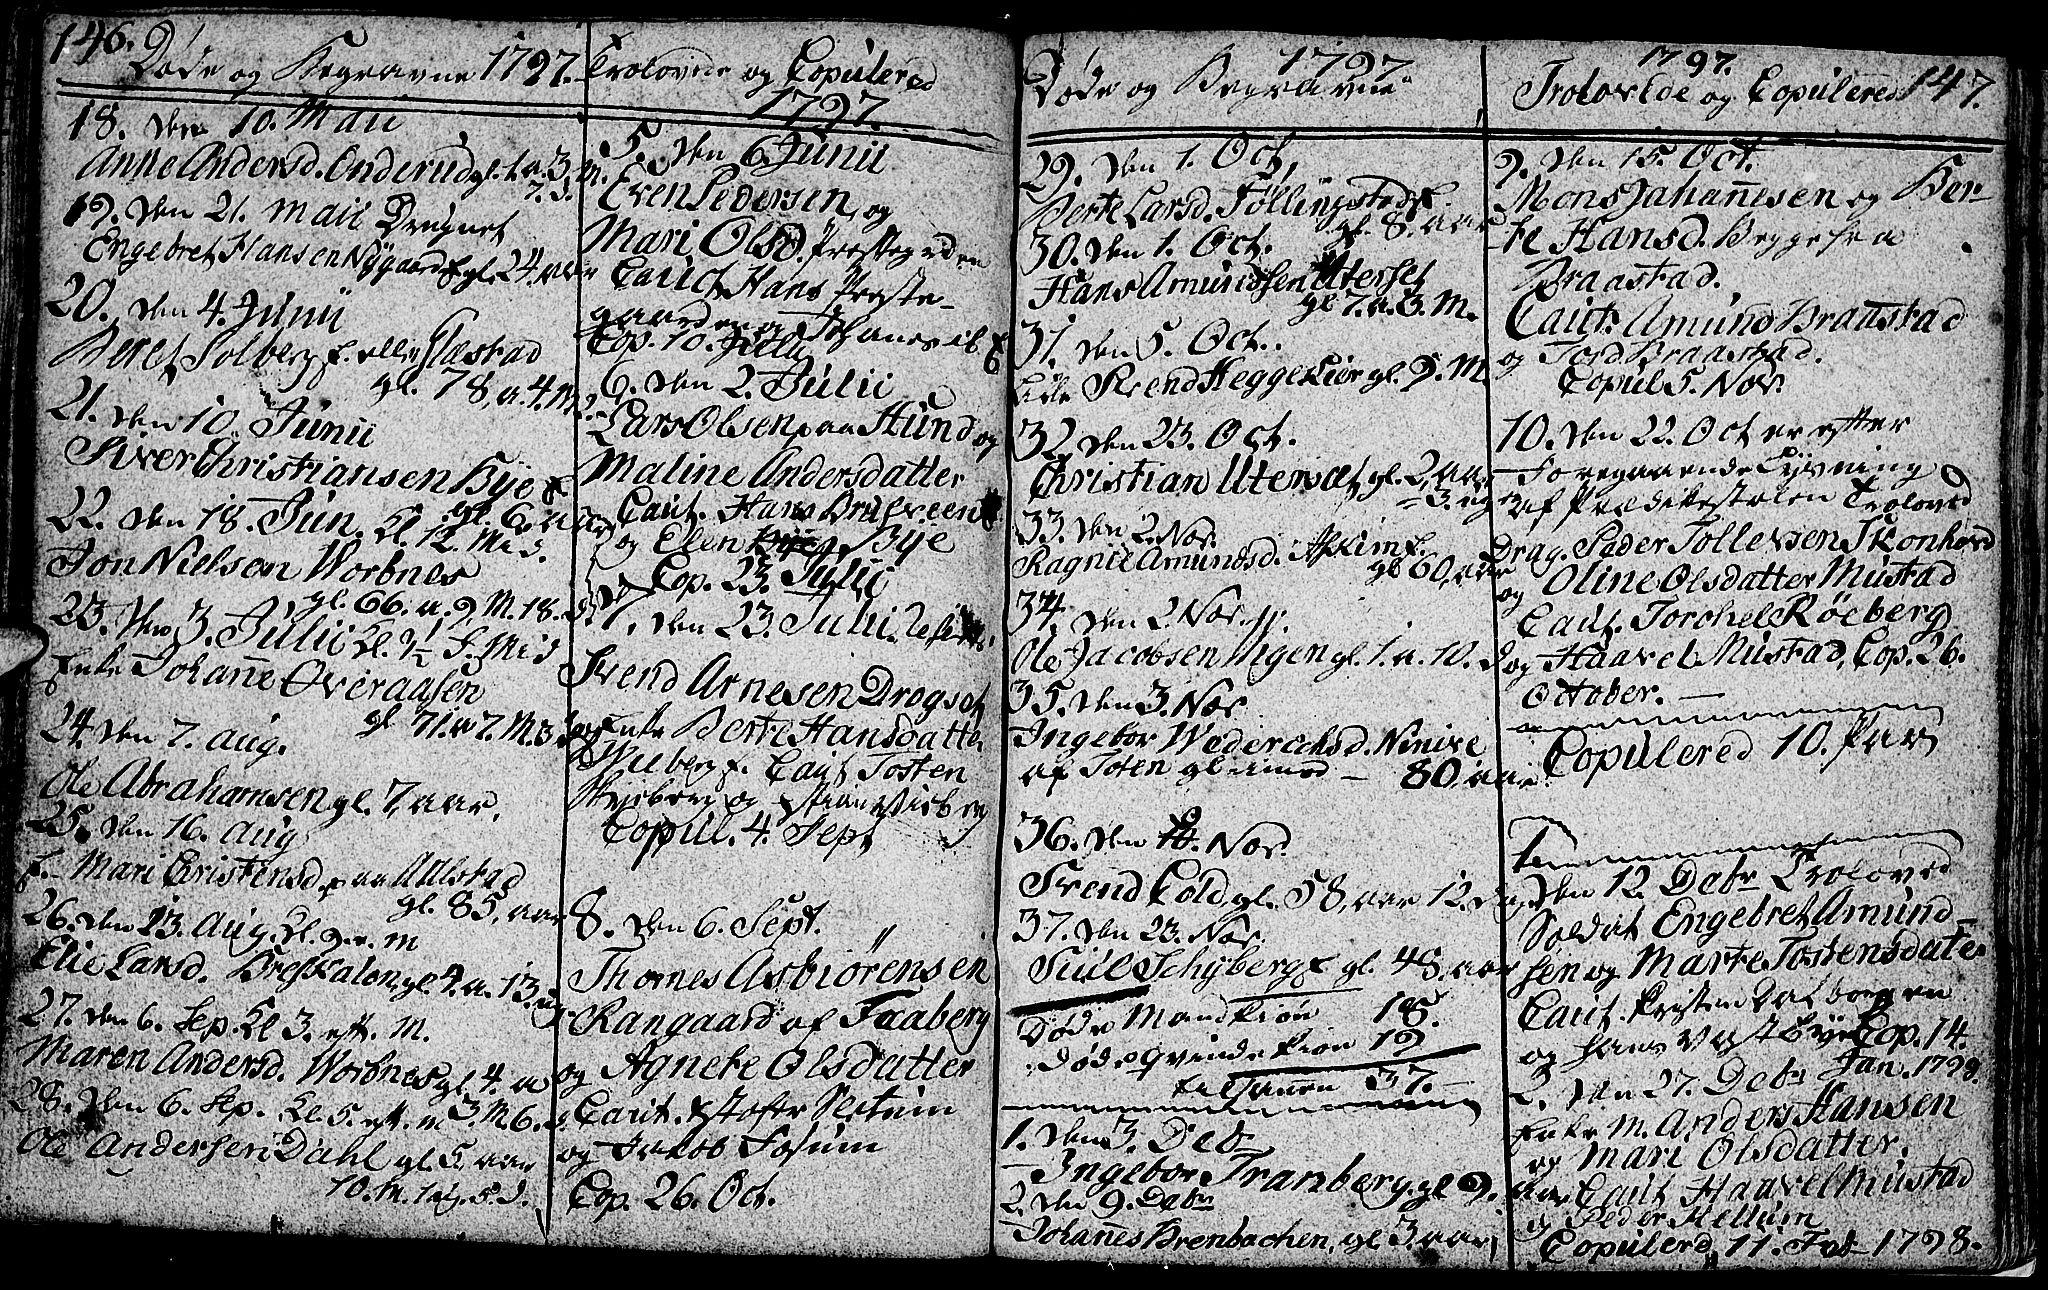 SAH, Vardal prestekontor, H/Ha/Hab/L0002: Klokkerbok nr. 2, 1790-1803, s. 146-147